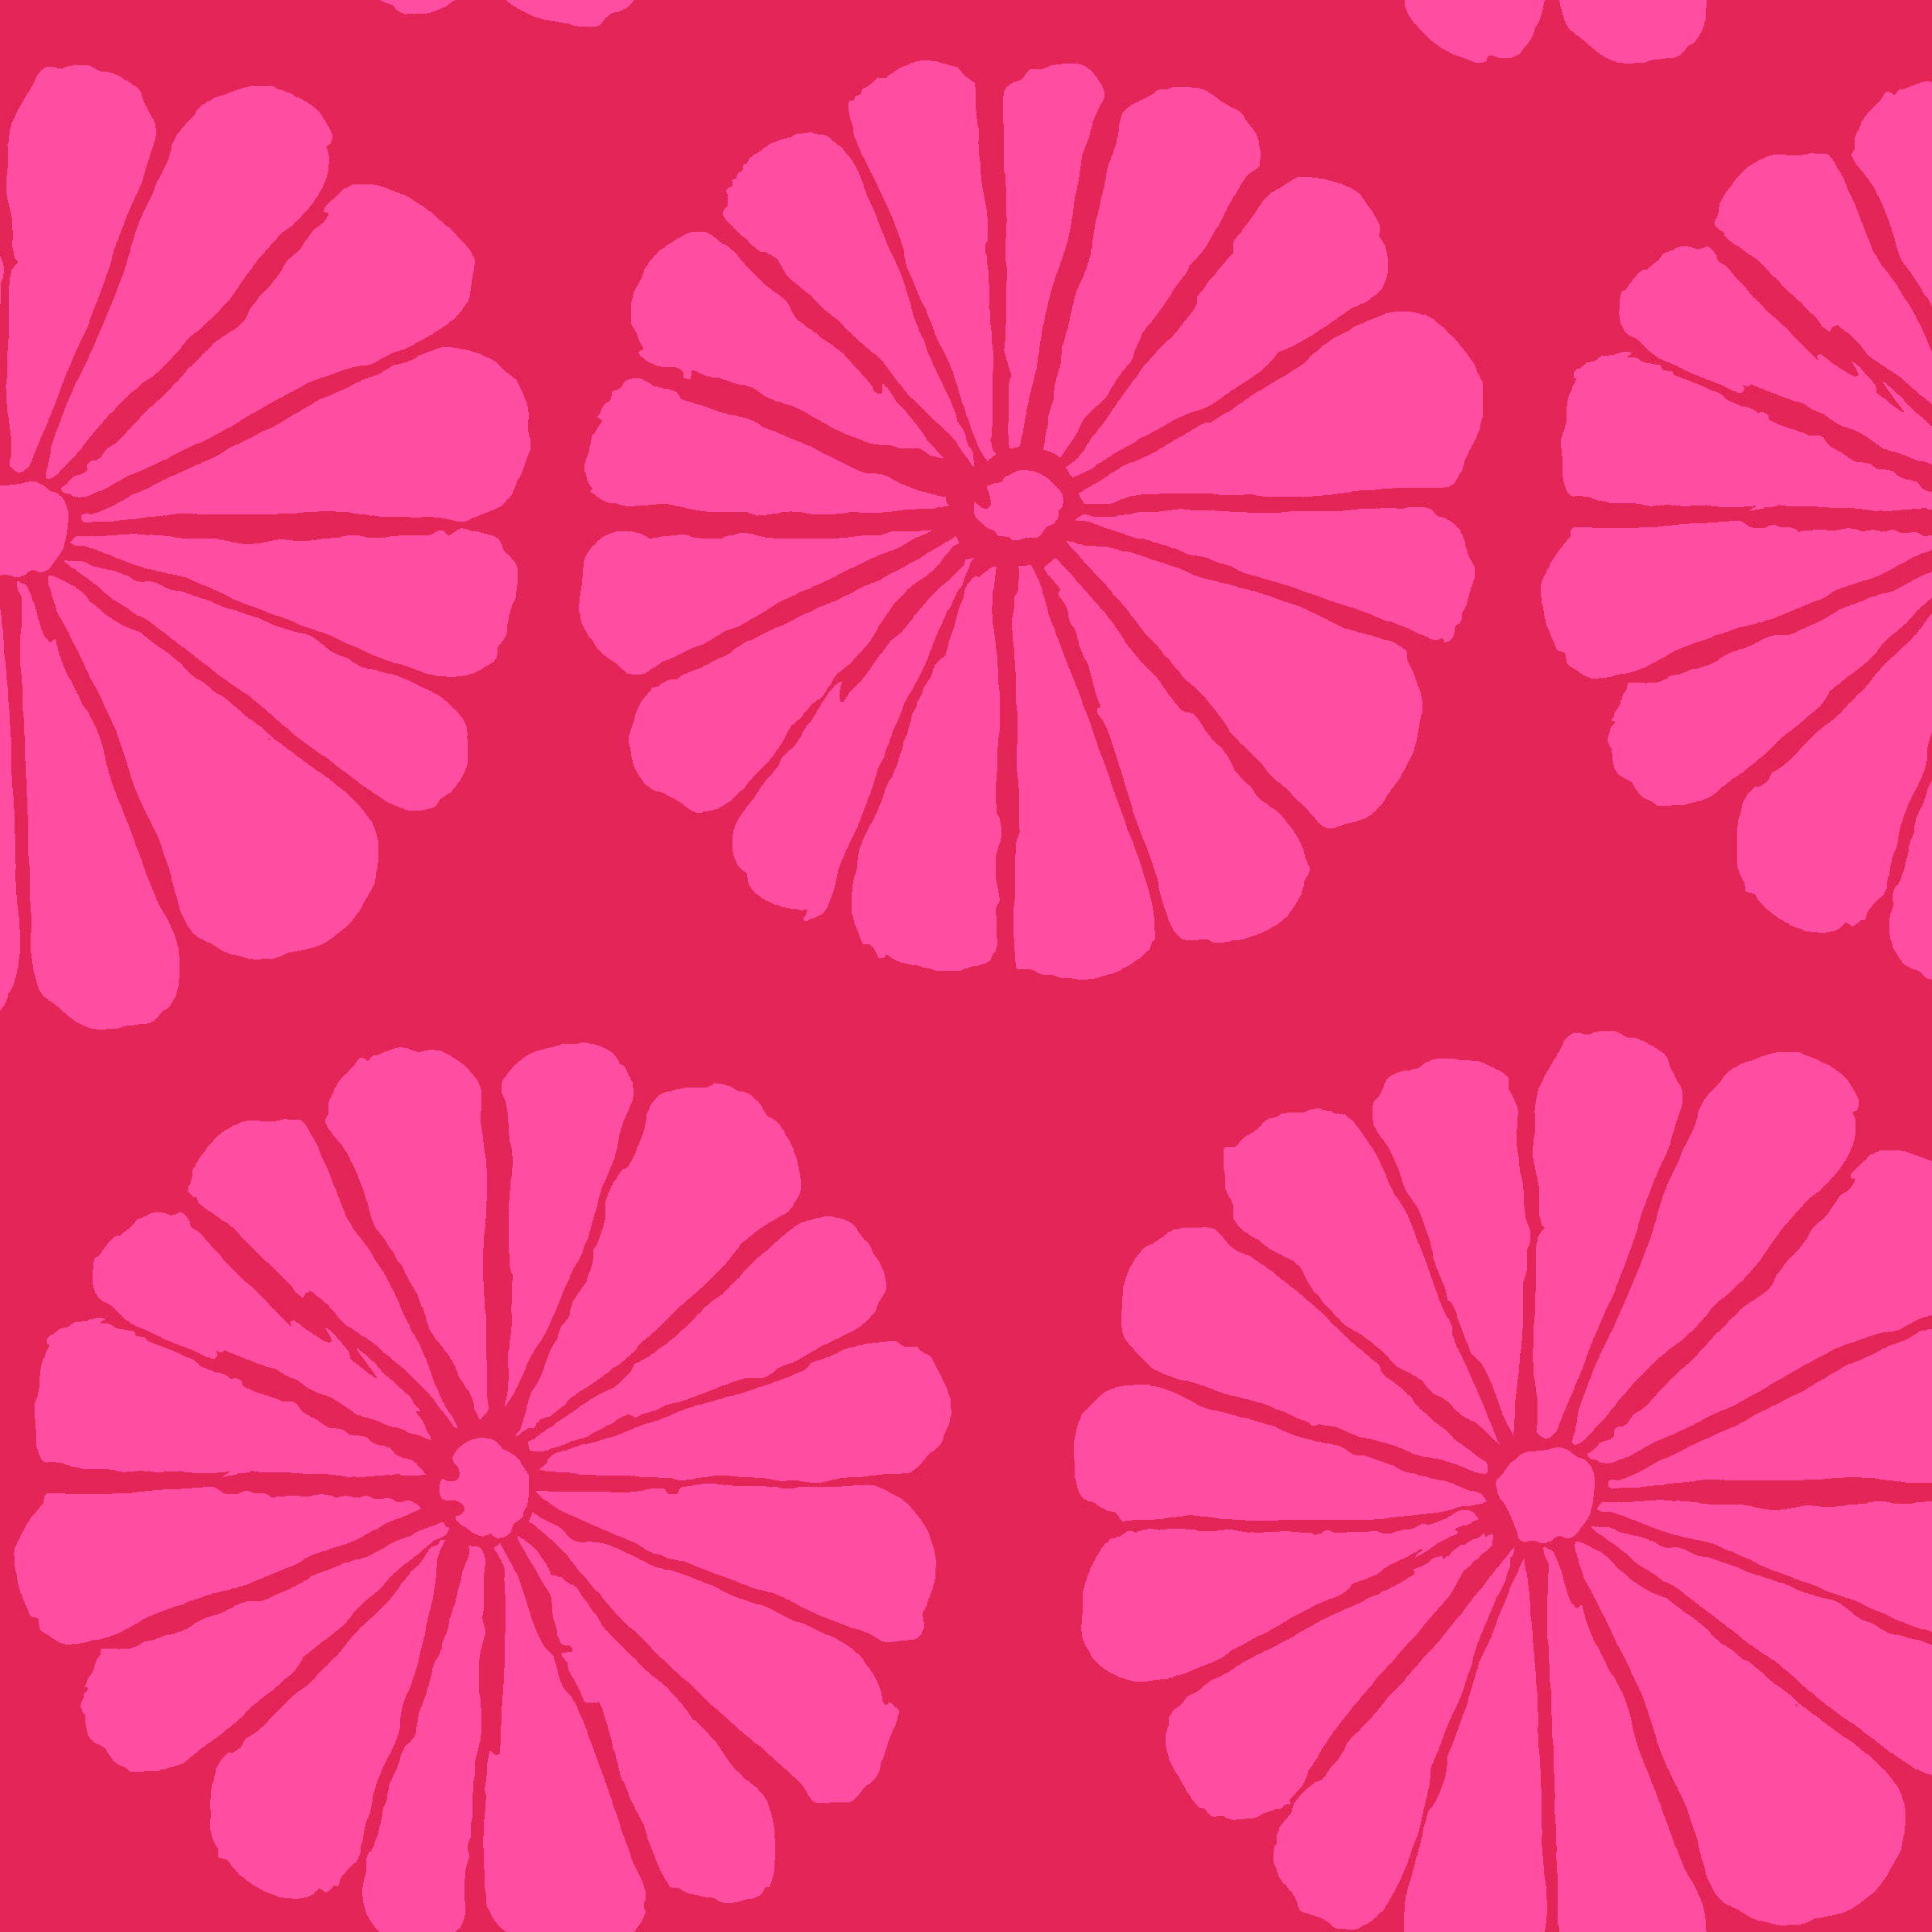 Damask Flower - PWGP183 - Magenta